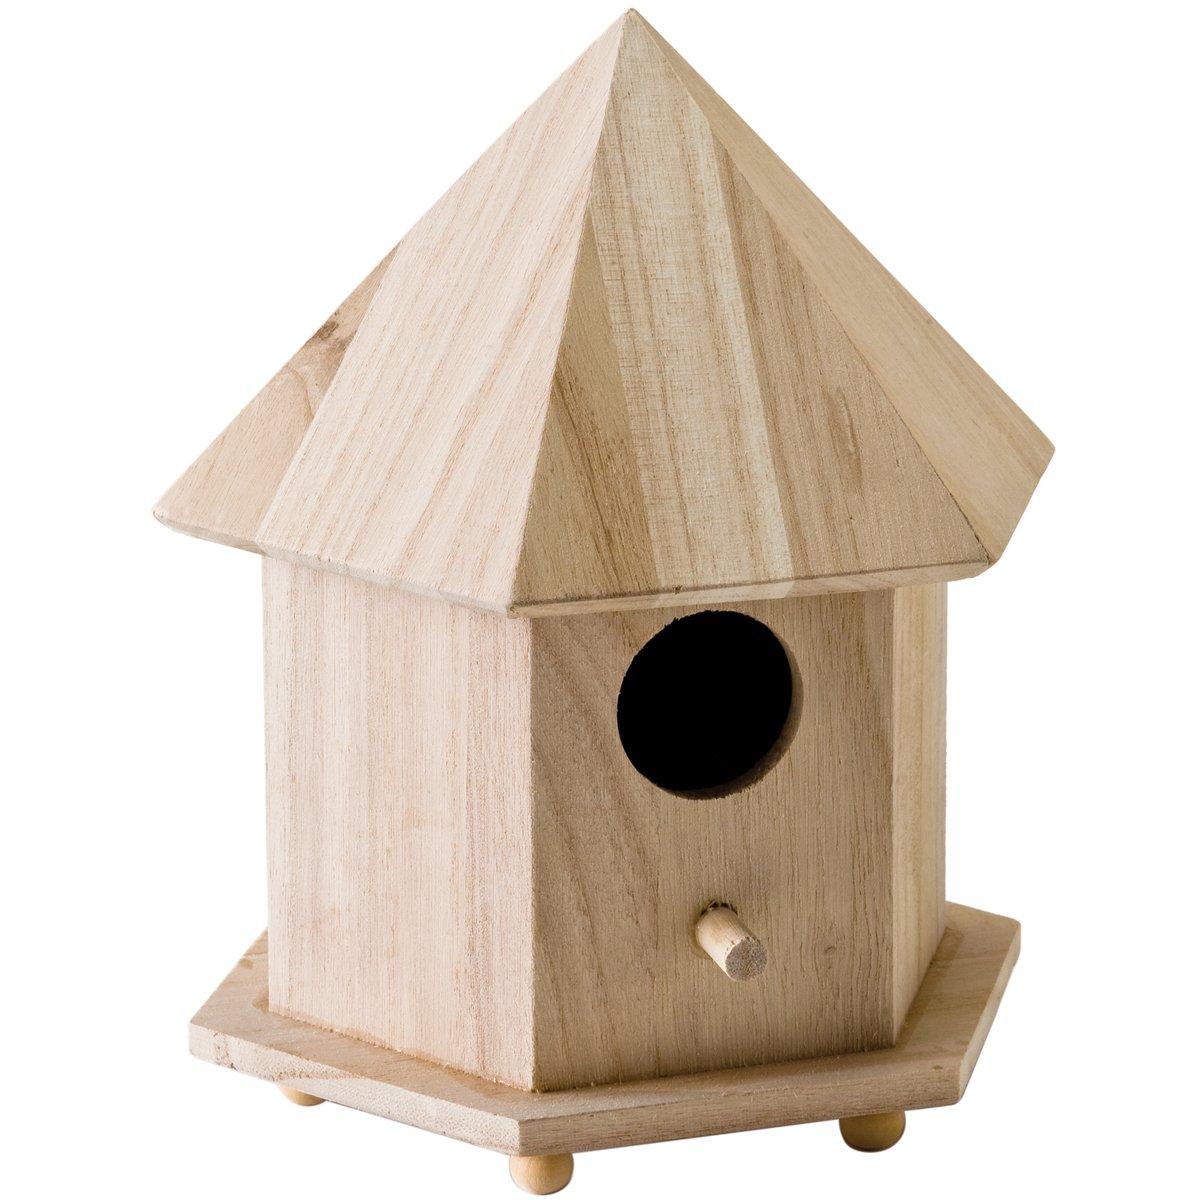 Plaid Wood Surface Crafting Birdhouse, 12740 Gazebo Plaid Inc. 12740E